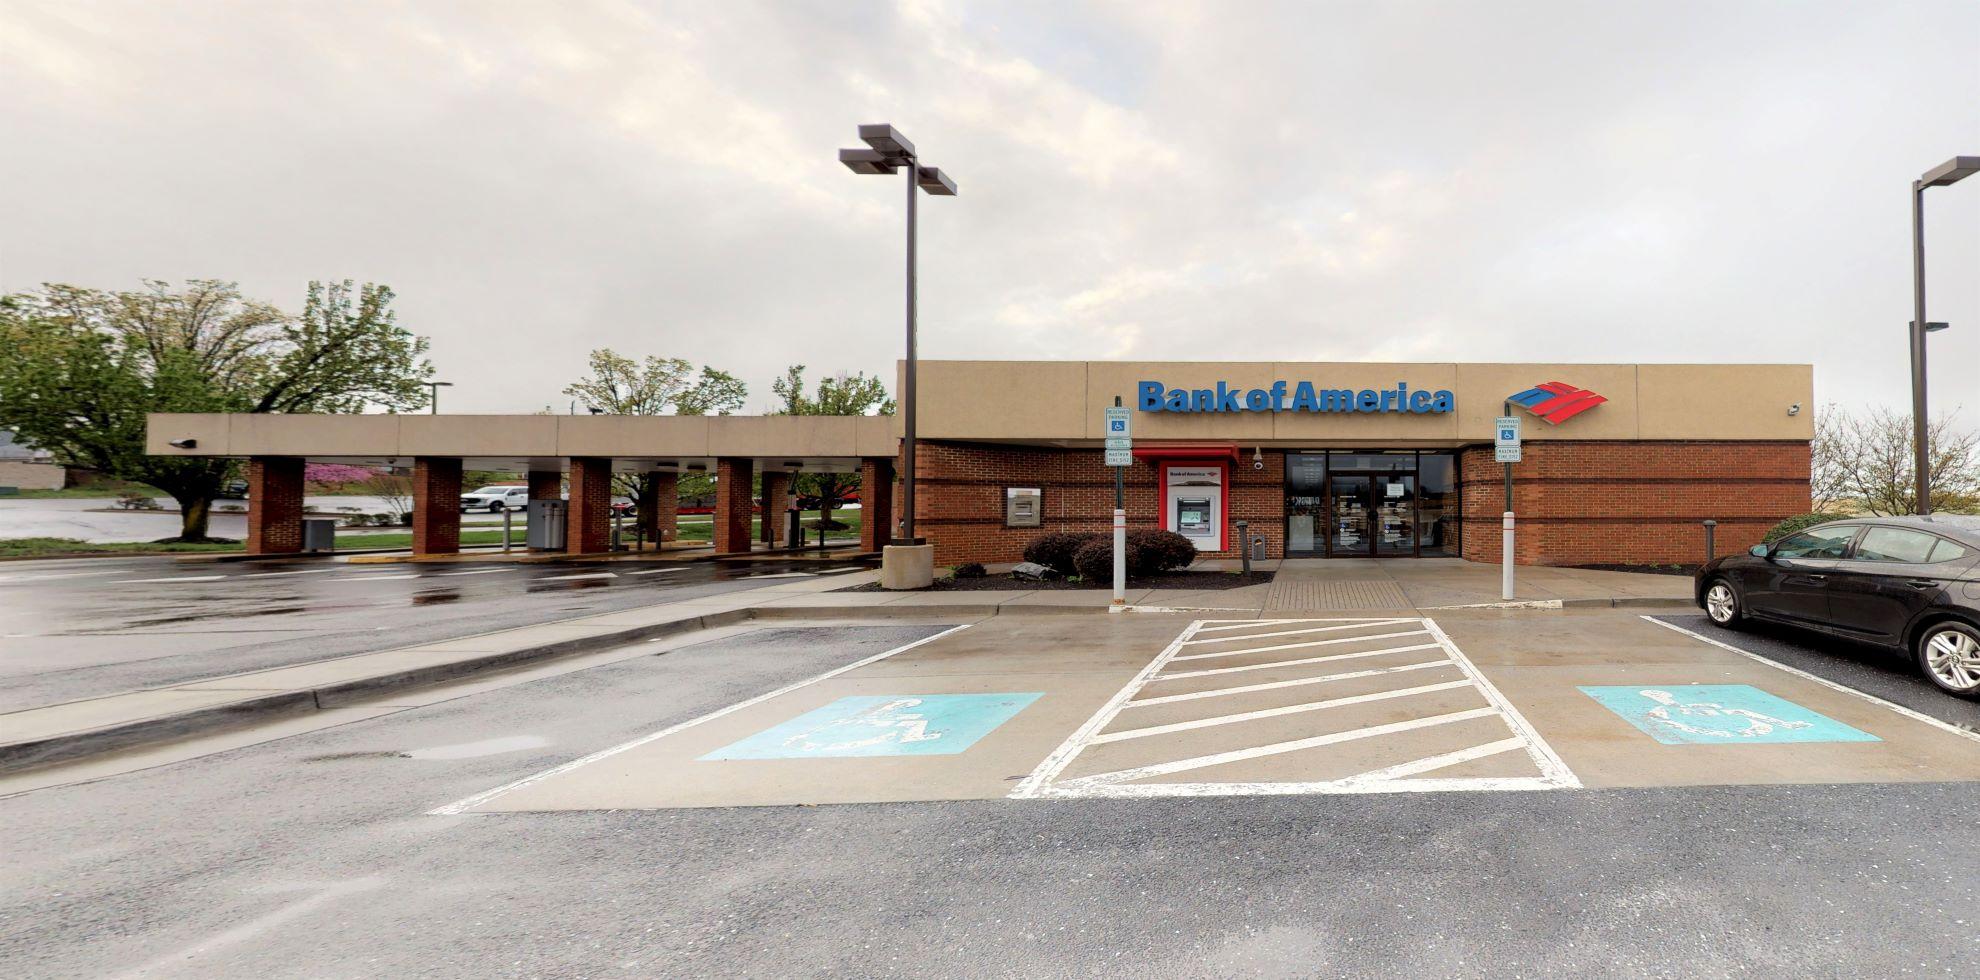 Bank of America financial center with drive-thru ATM and teller   79 University Blvd, Harrisonburg, VA 22801